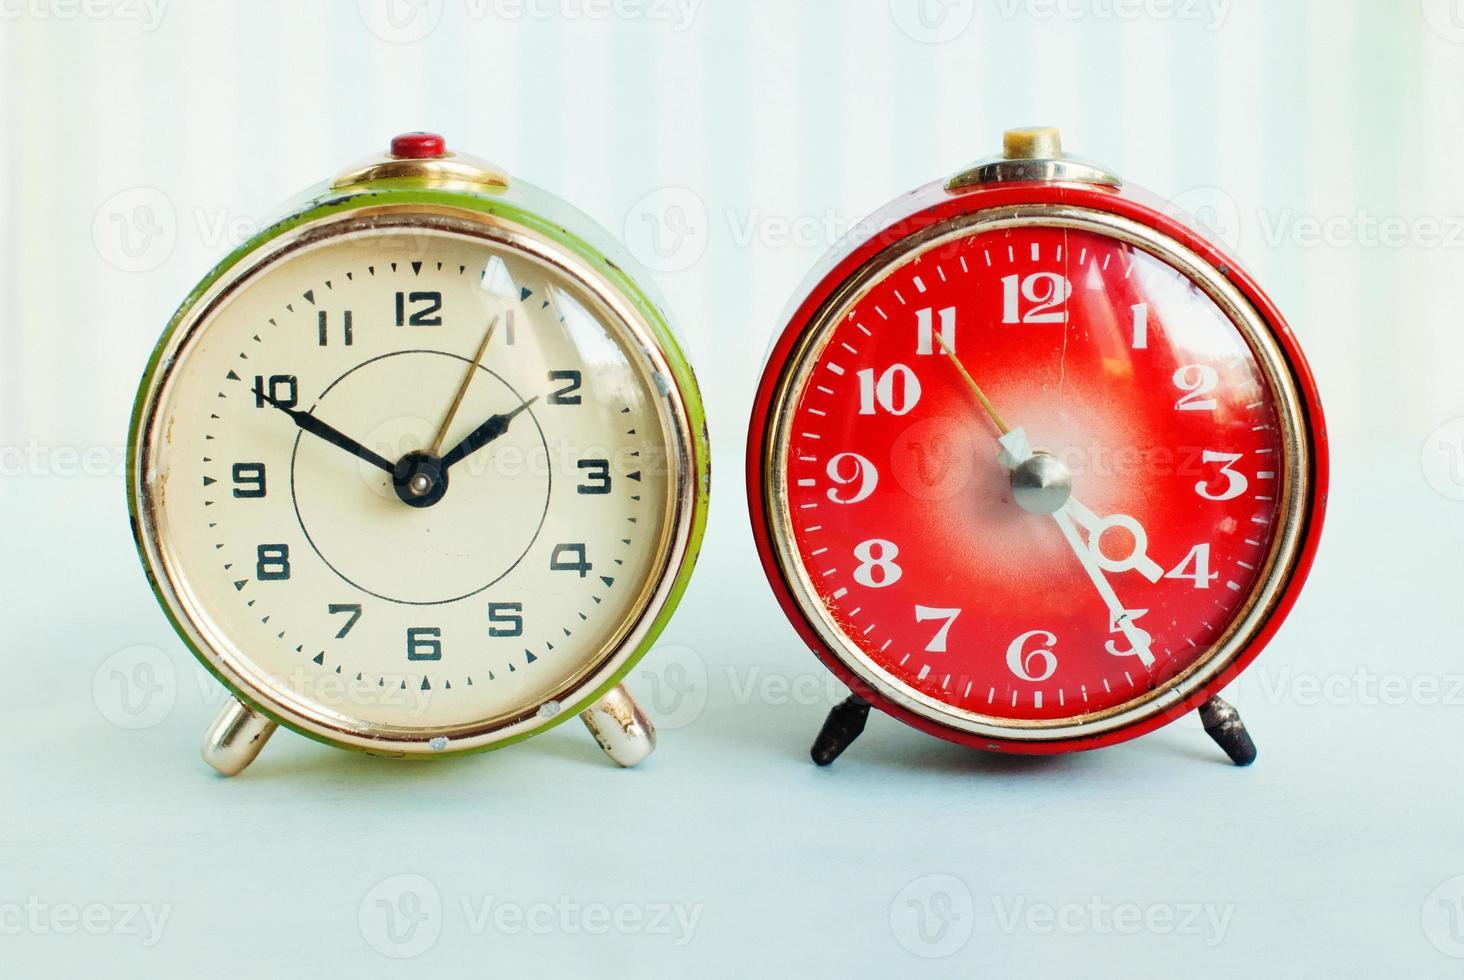 horloges vintage photo